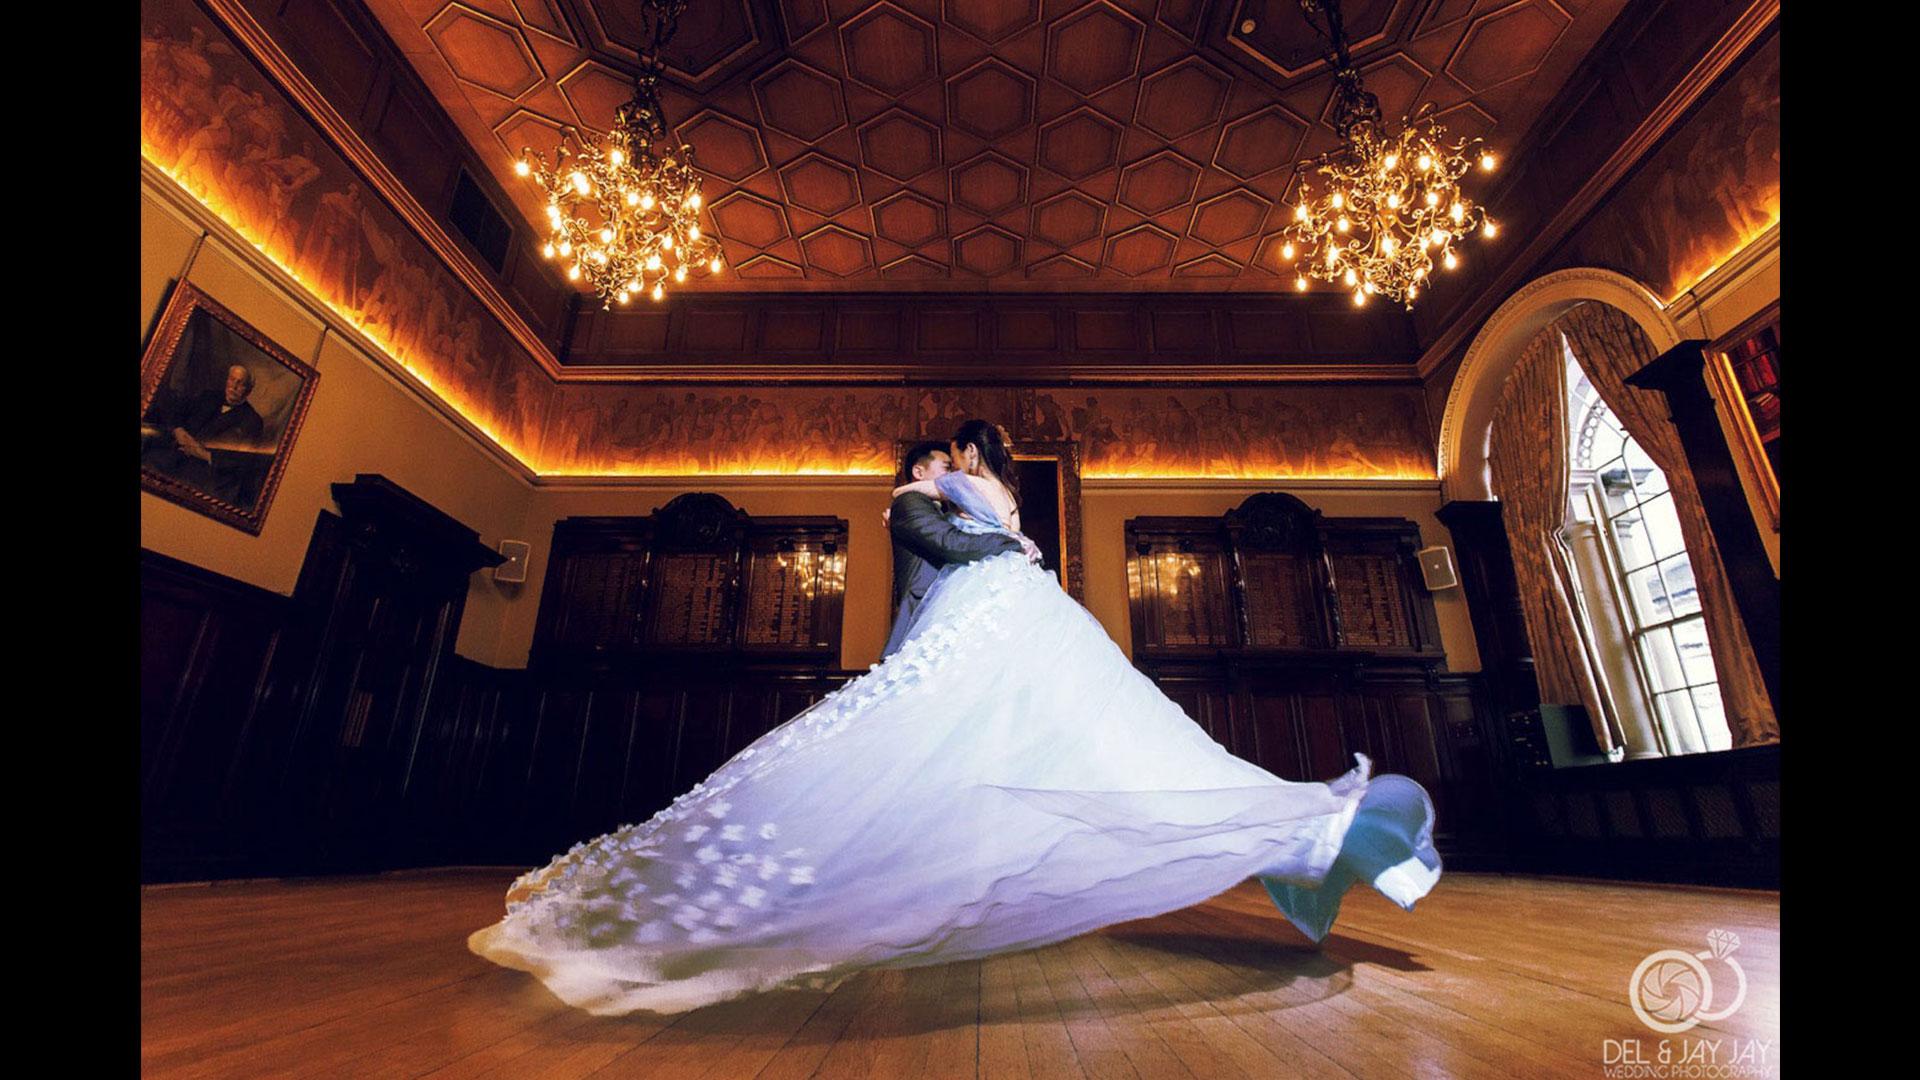 Weddings | Photographer: Derek RobertsonCurator: Bryan Esler